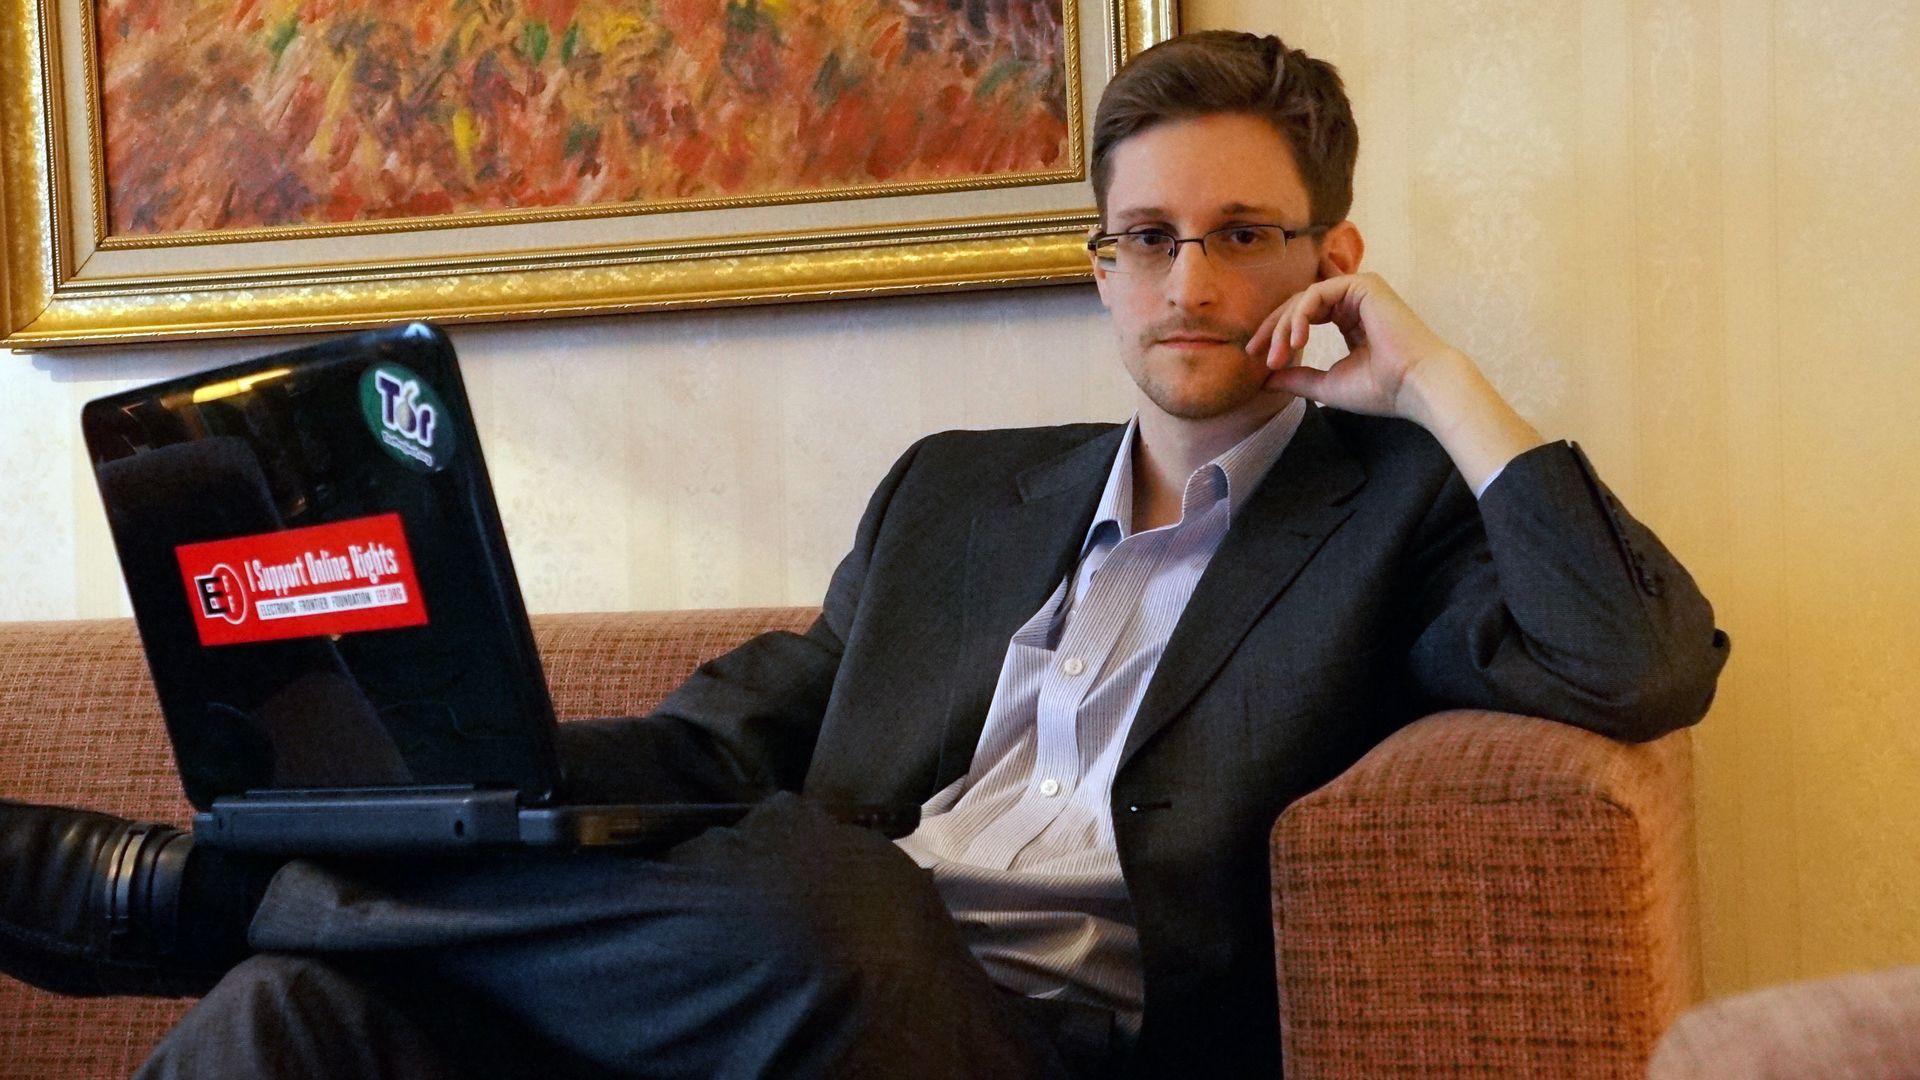 Edward Snowden to release memoir this fall